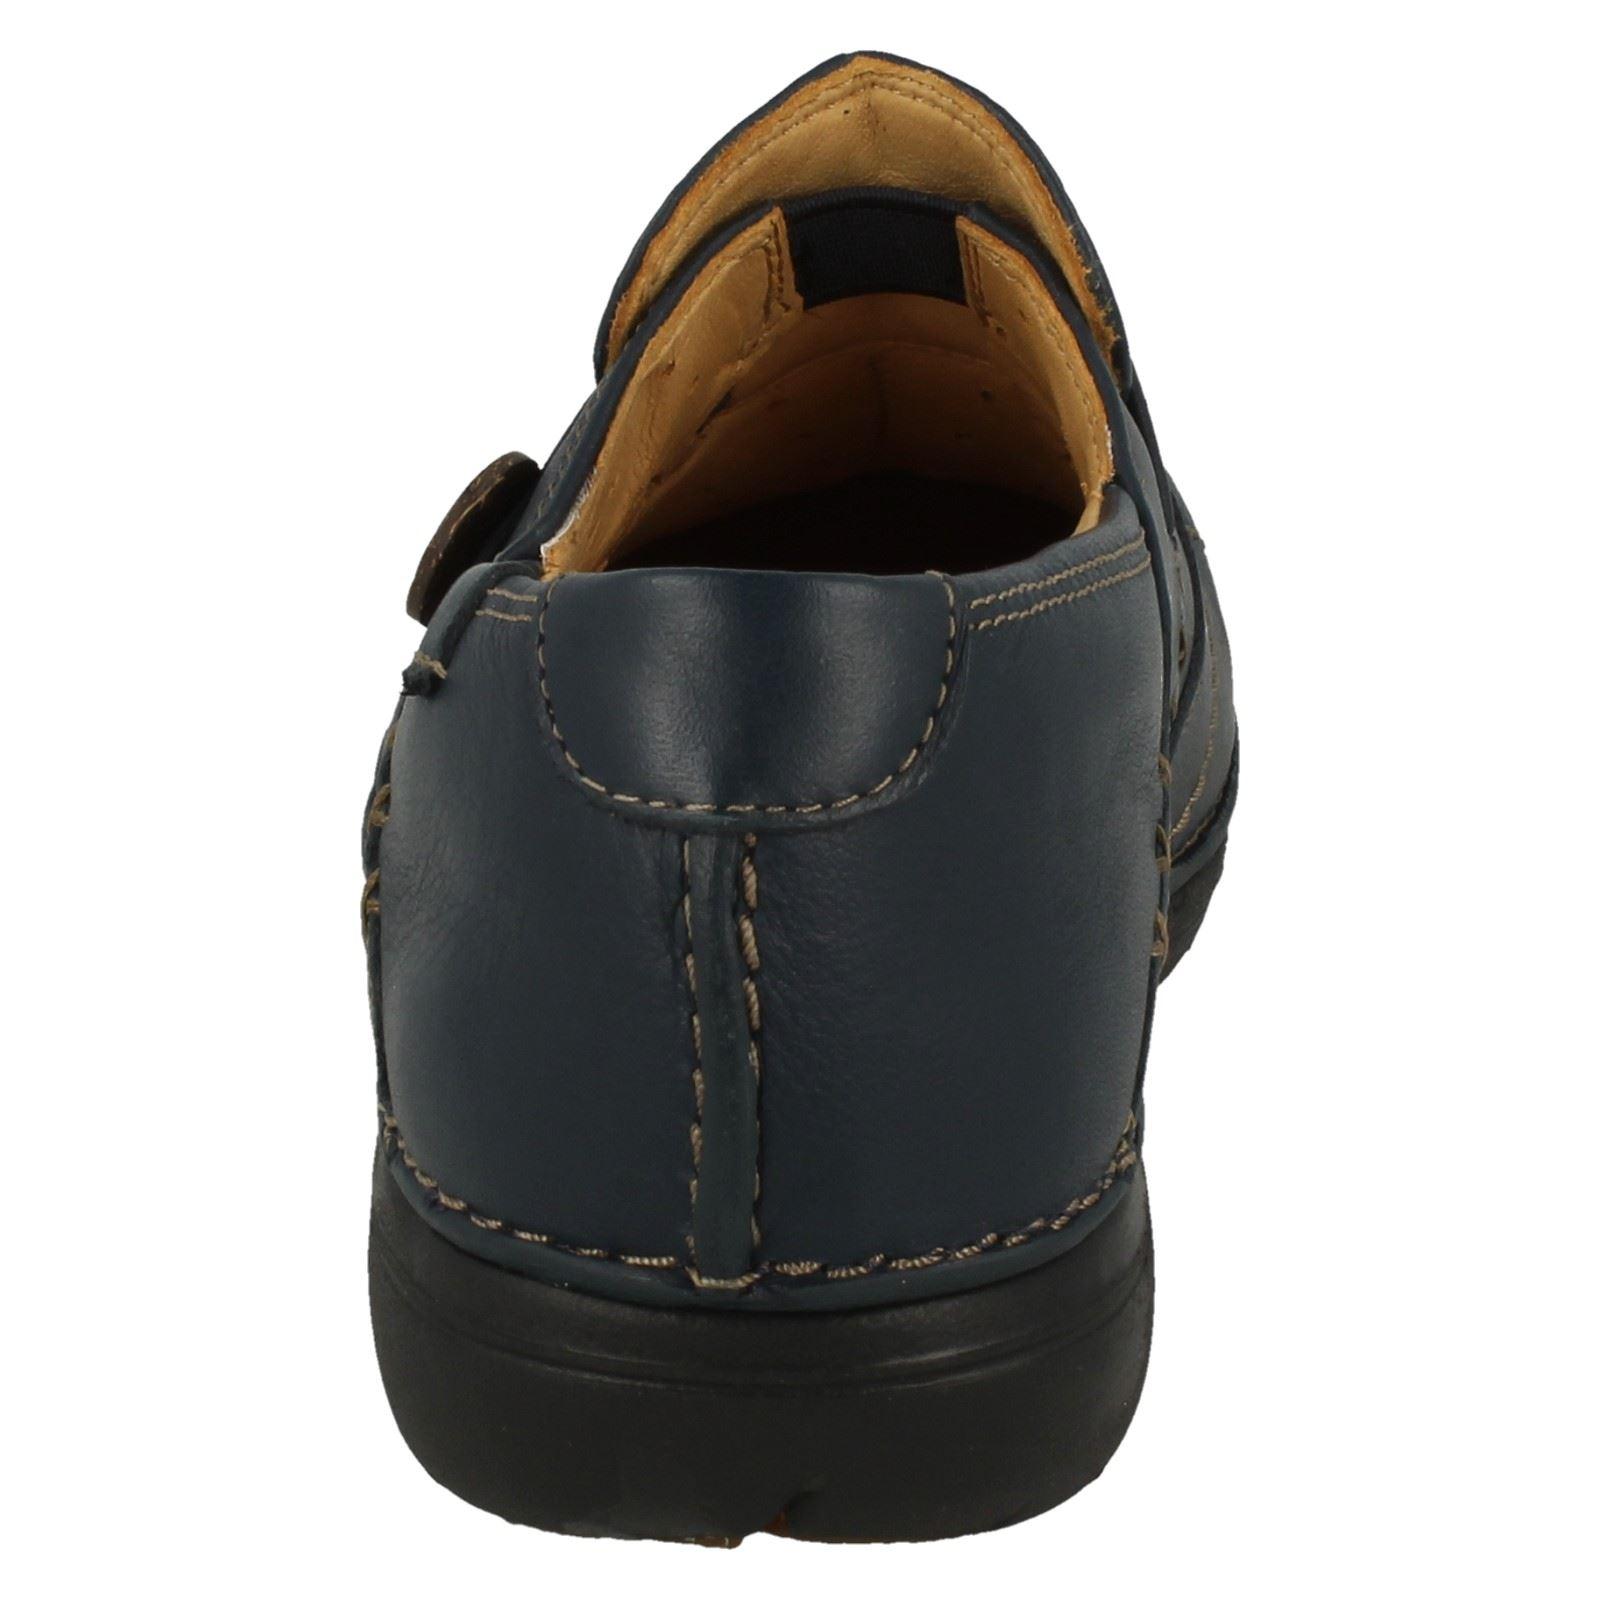 Ladies Clarks Un Structured Slip On Shoes Un Loop